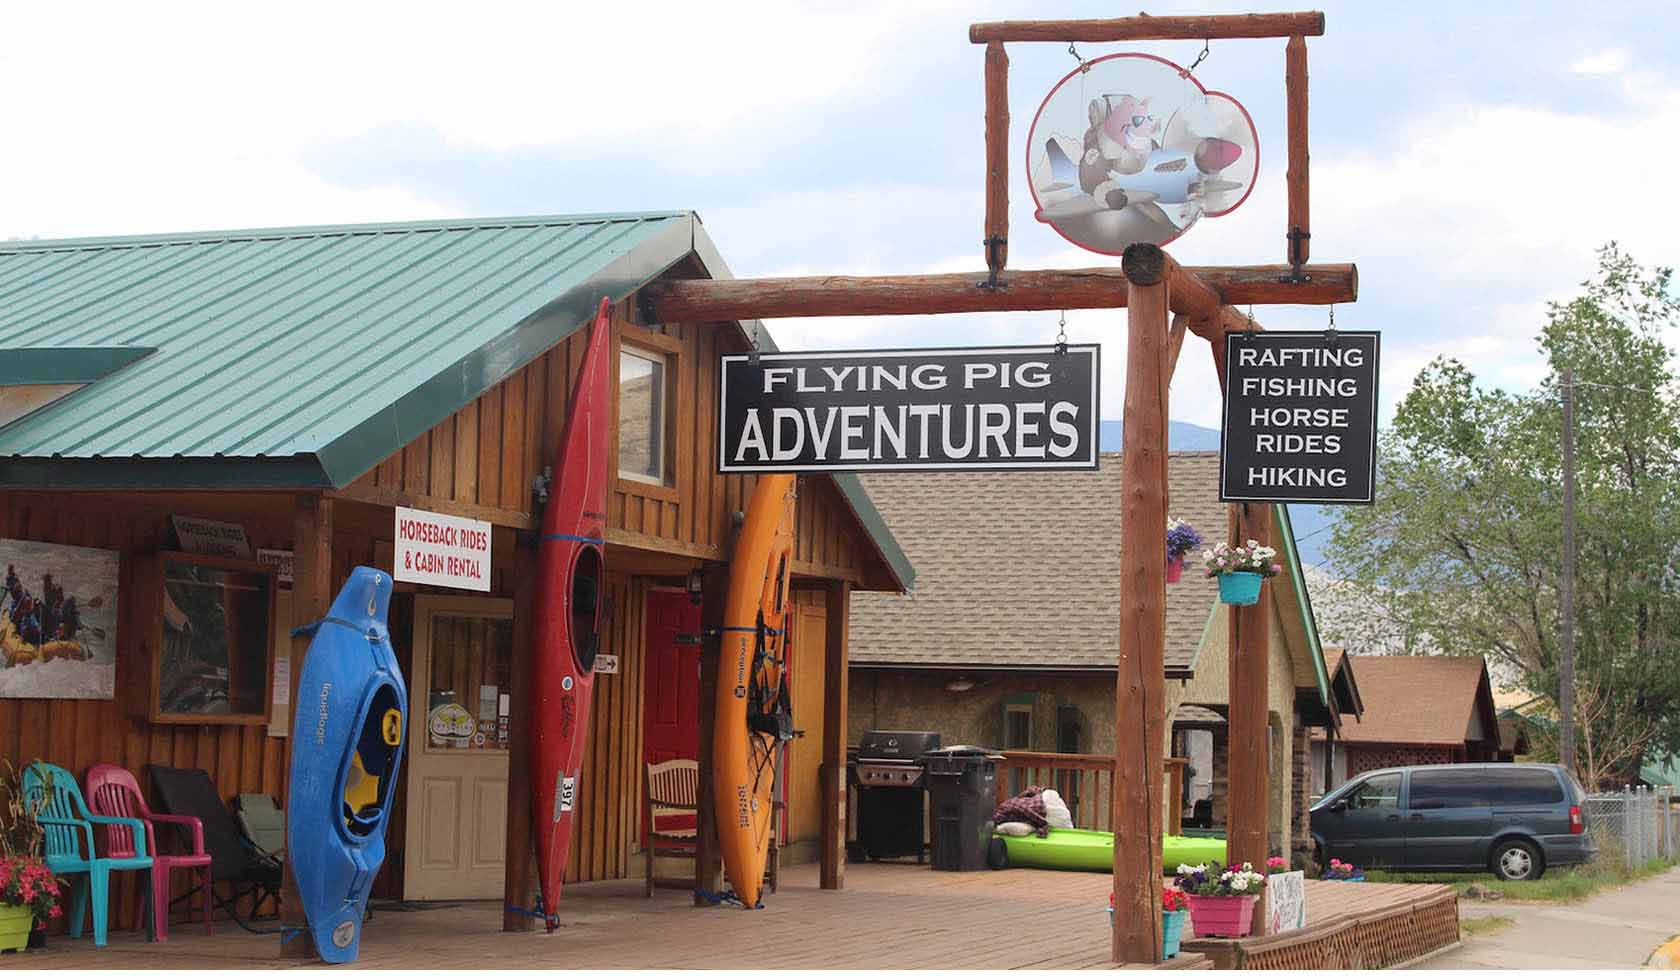 Flying Pig Adventure Company profile image